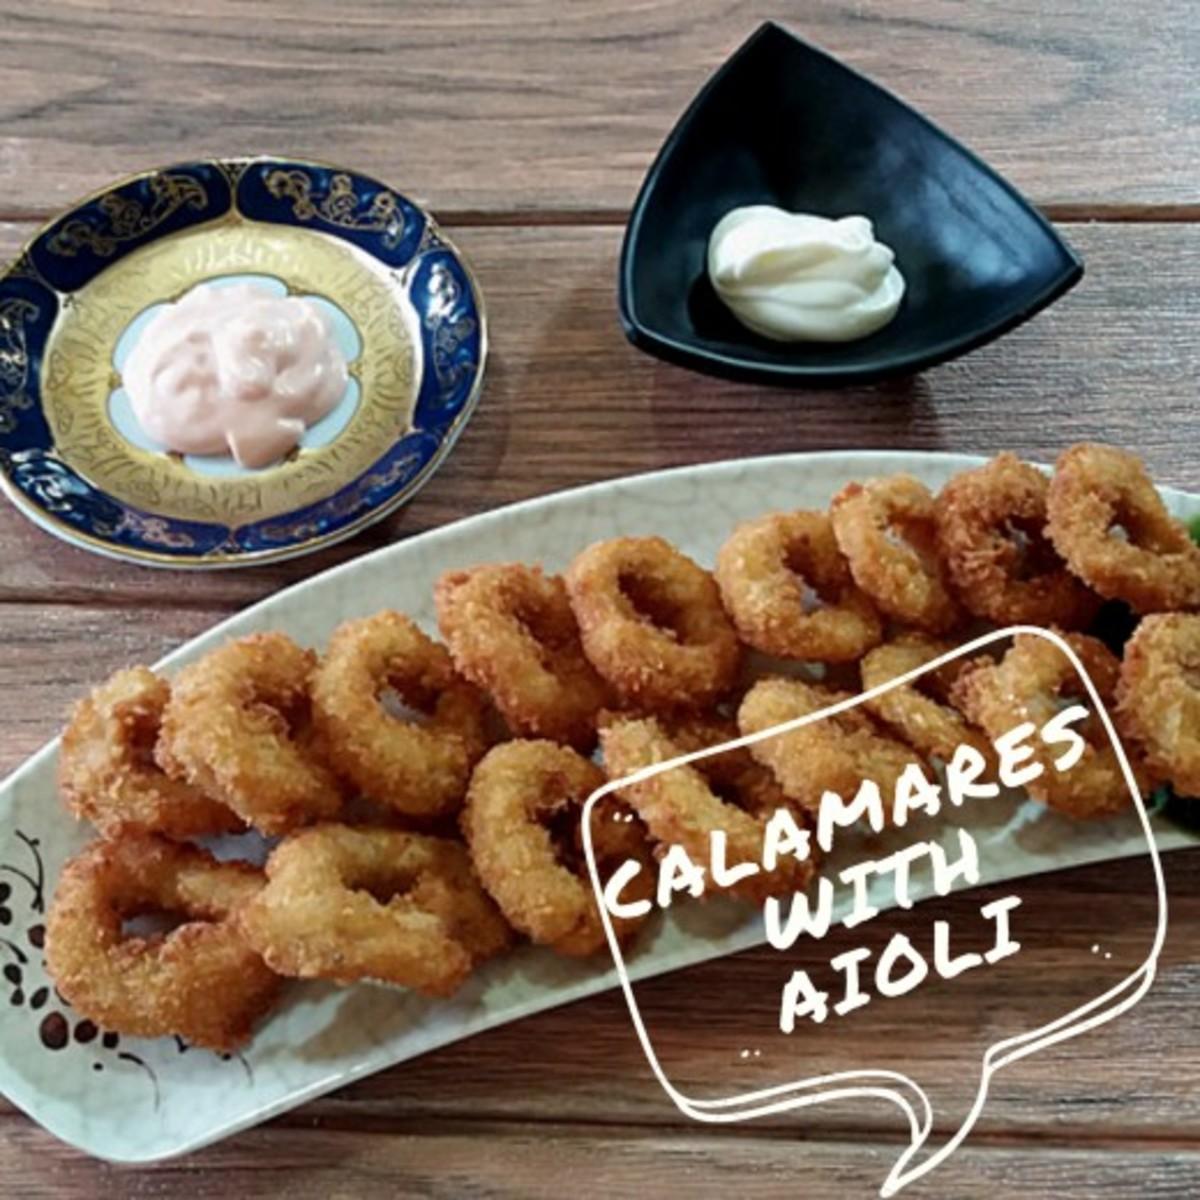 How to Cook Calamares Fritos With Aioli